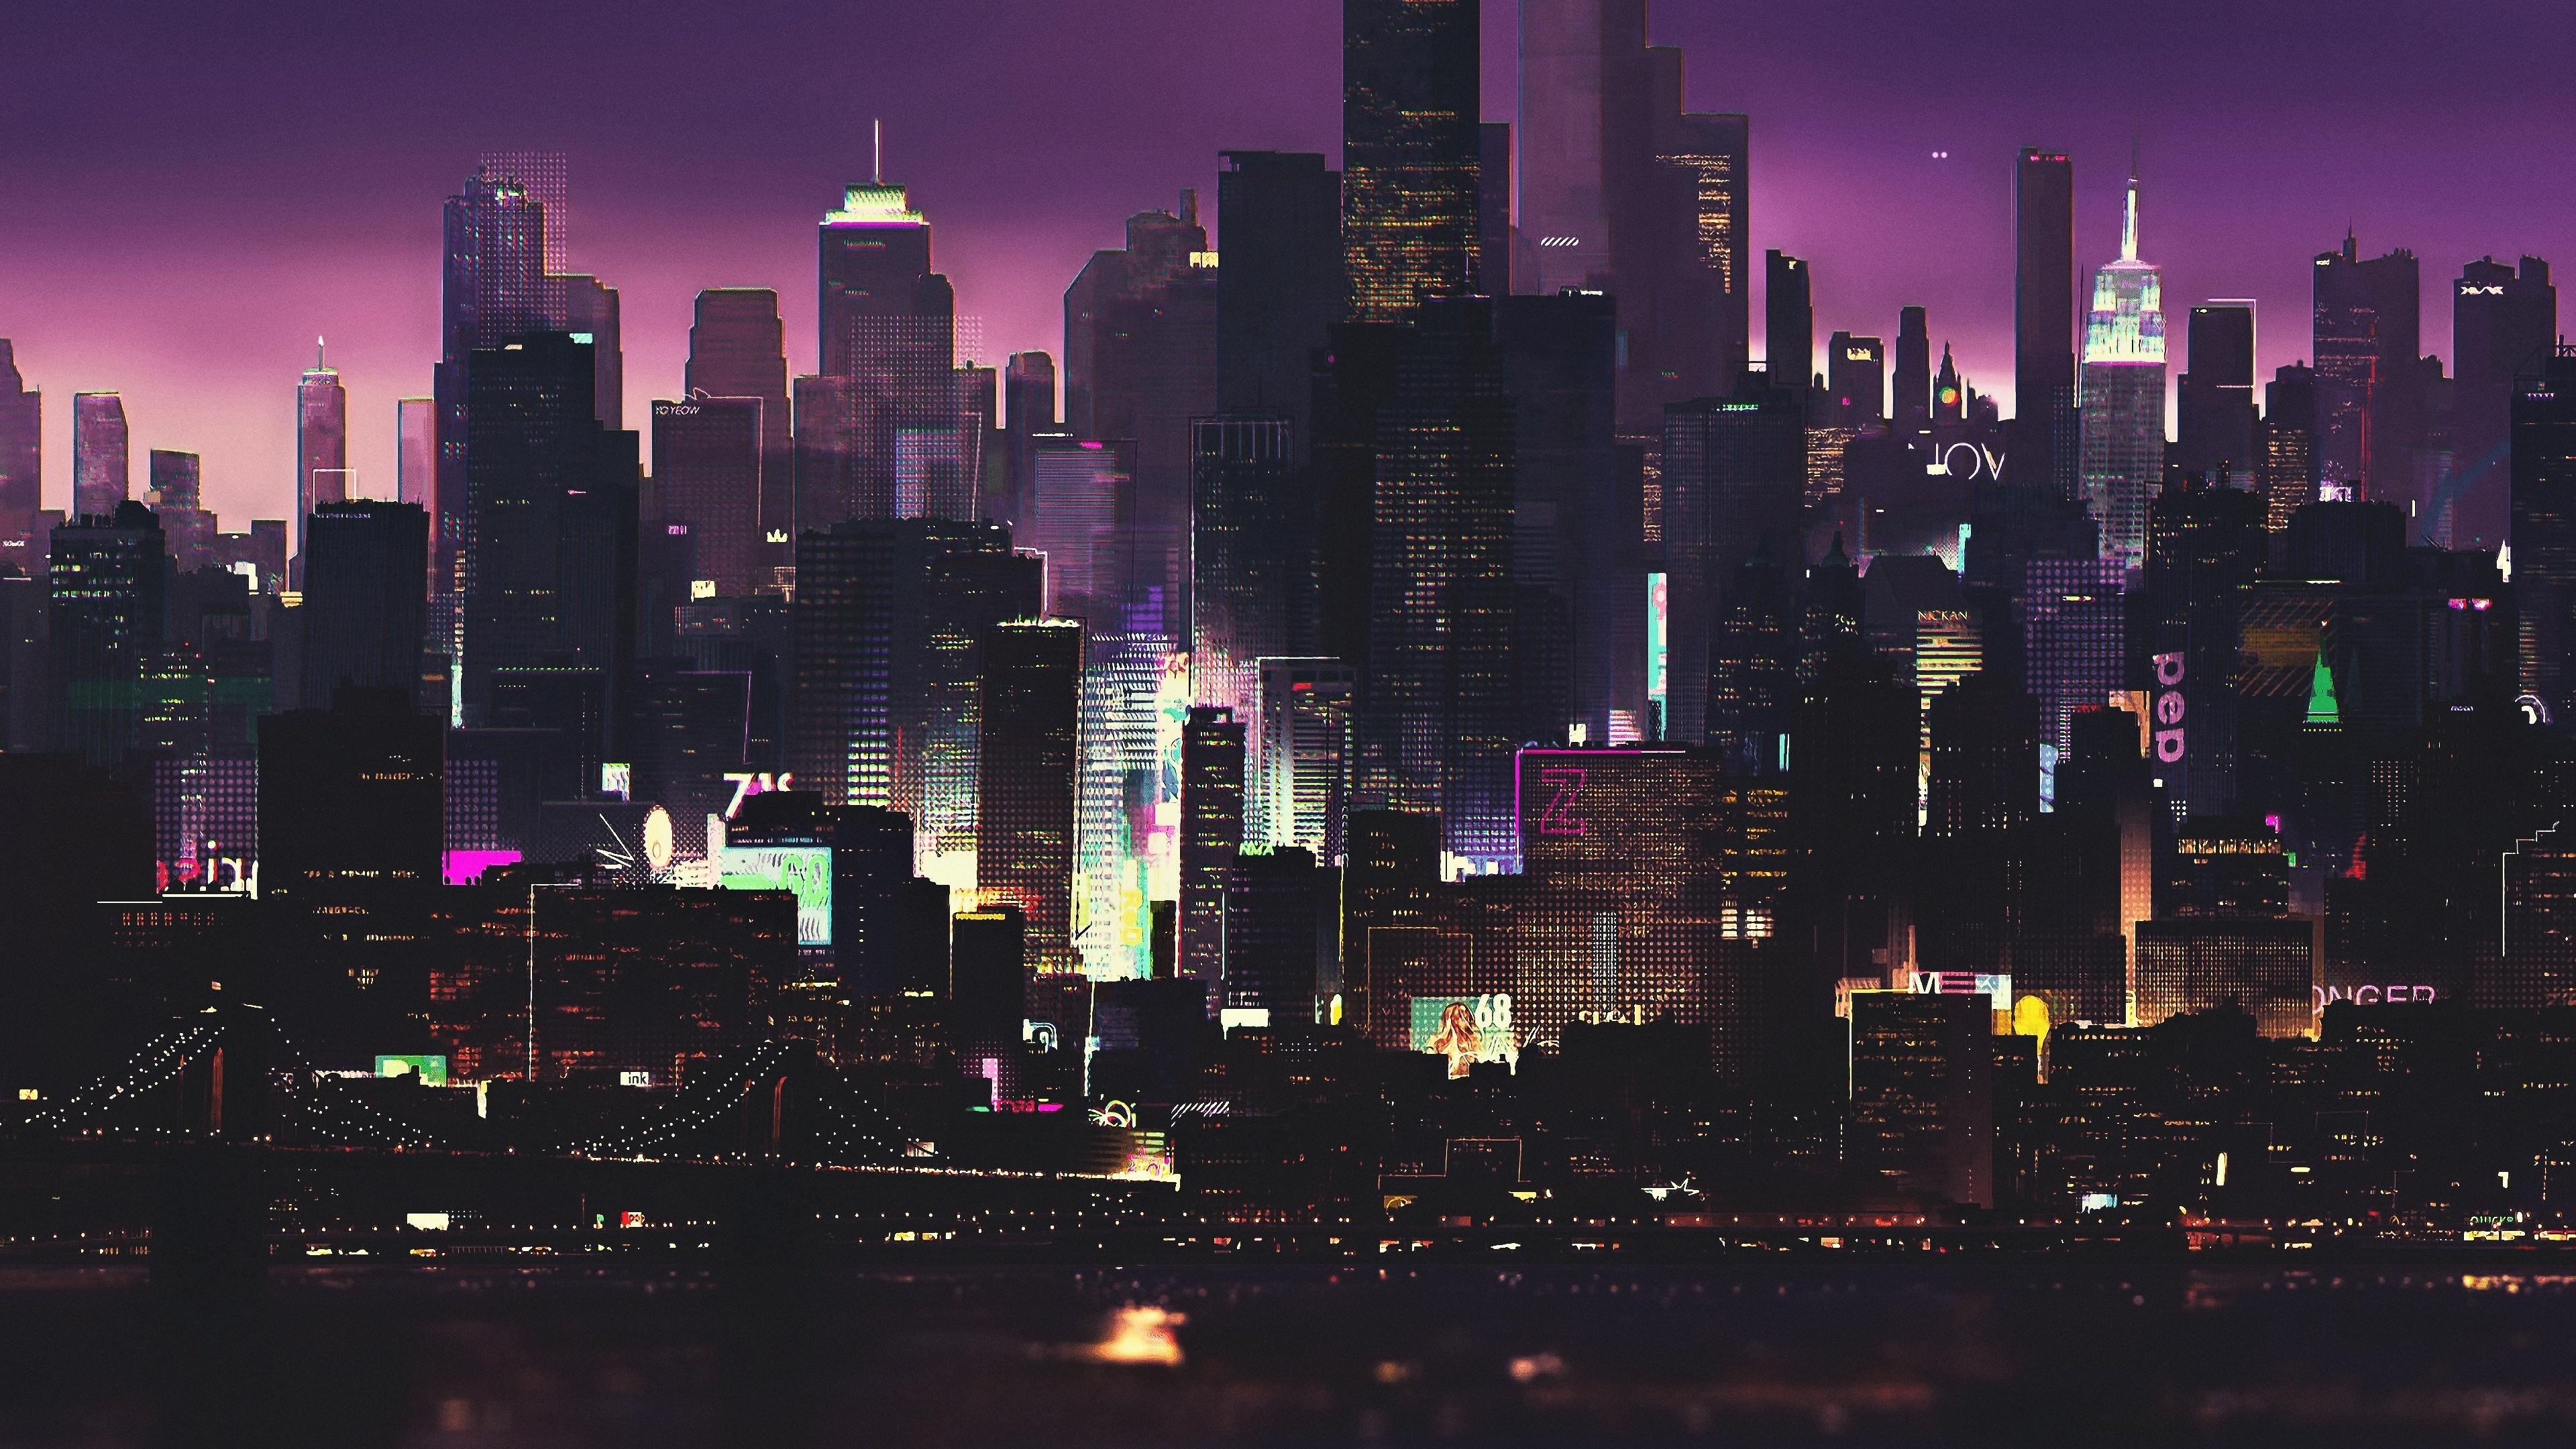 Download 3840x2160 Wallpaper Cyberpunk Buildings Dark